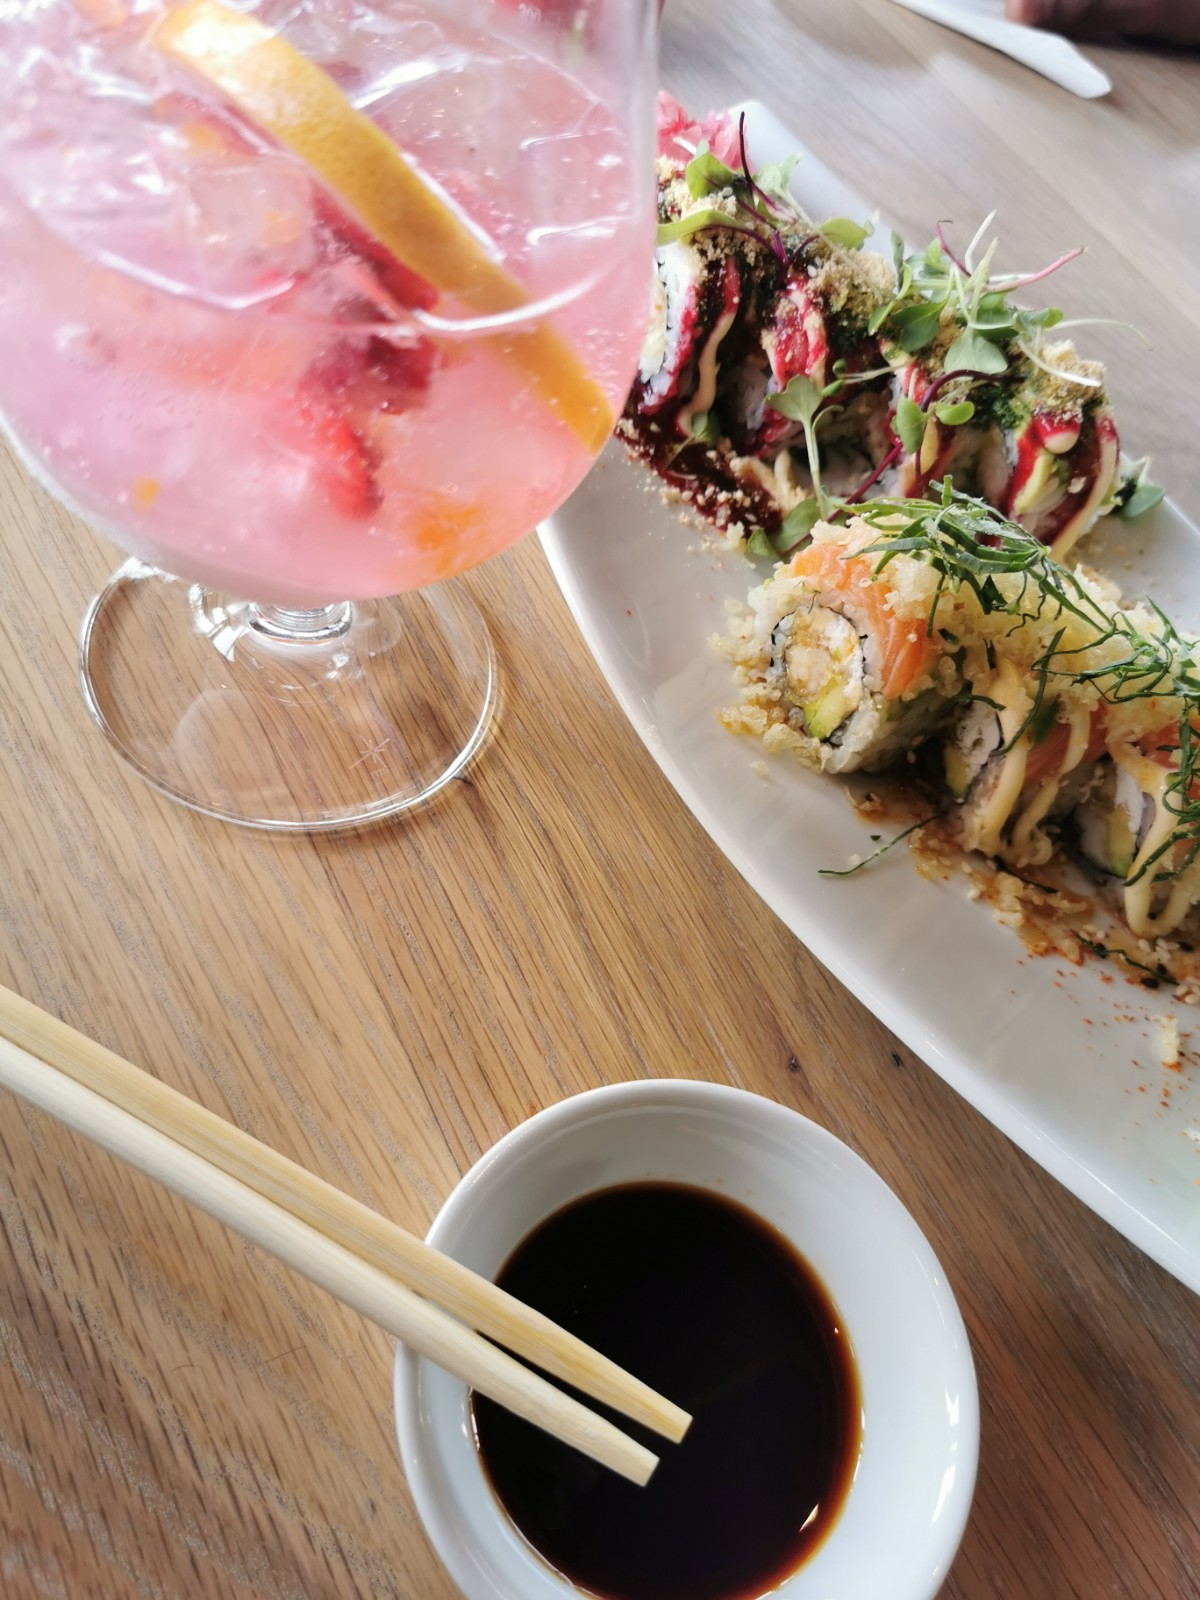 Best Sushi in Jozi |Wasabi Sushi & Grill